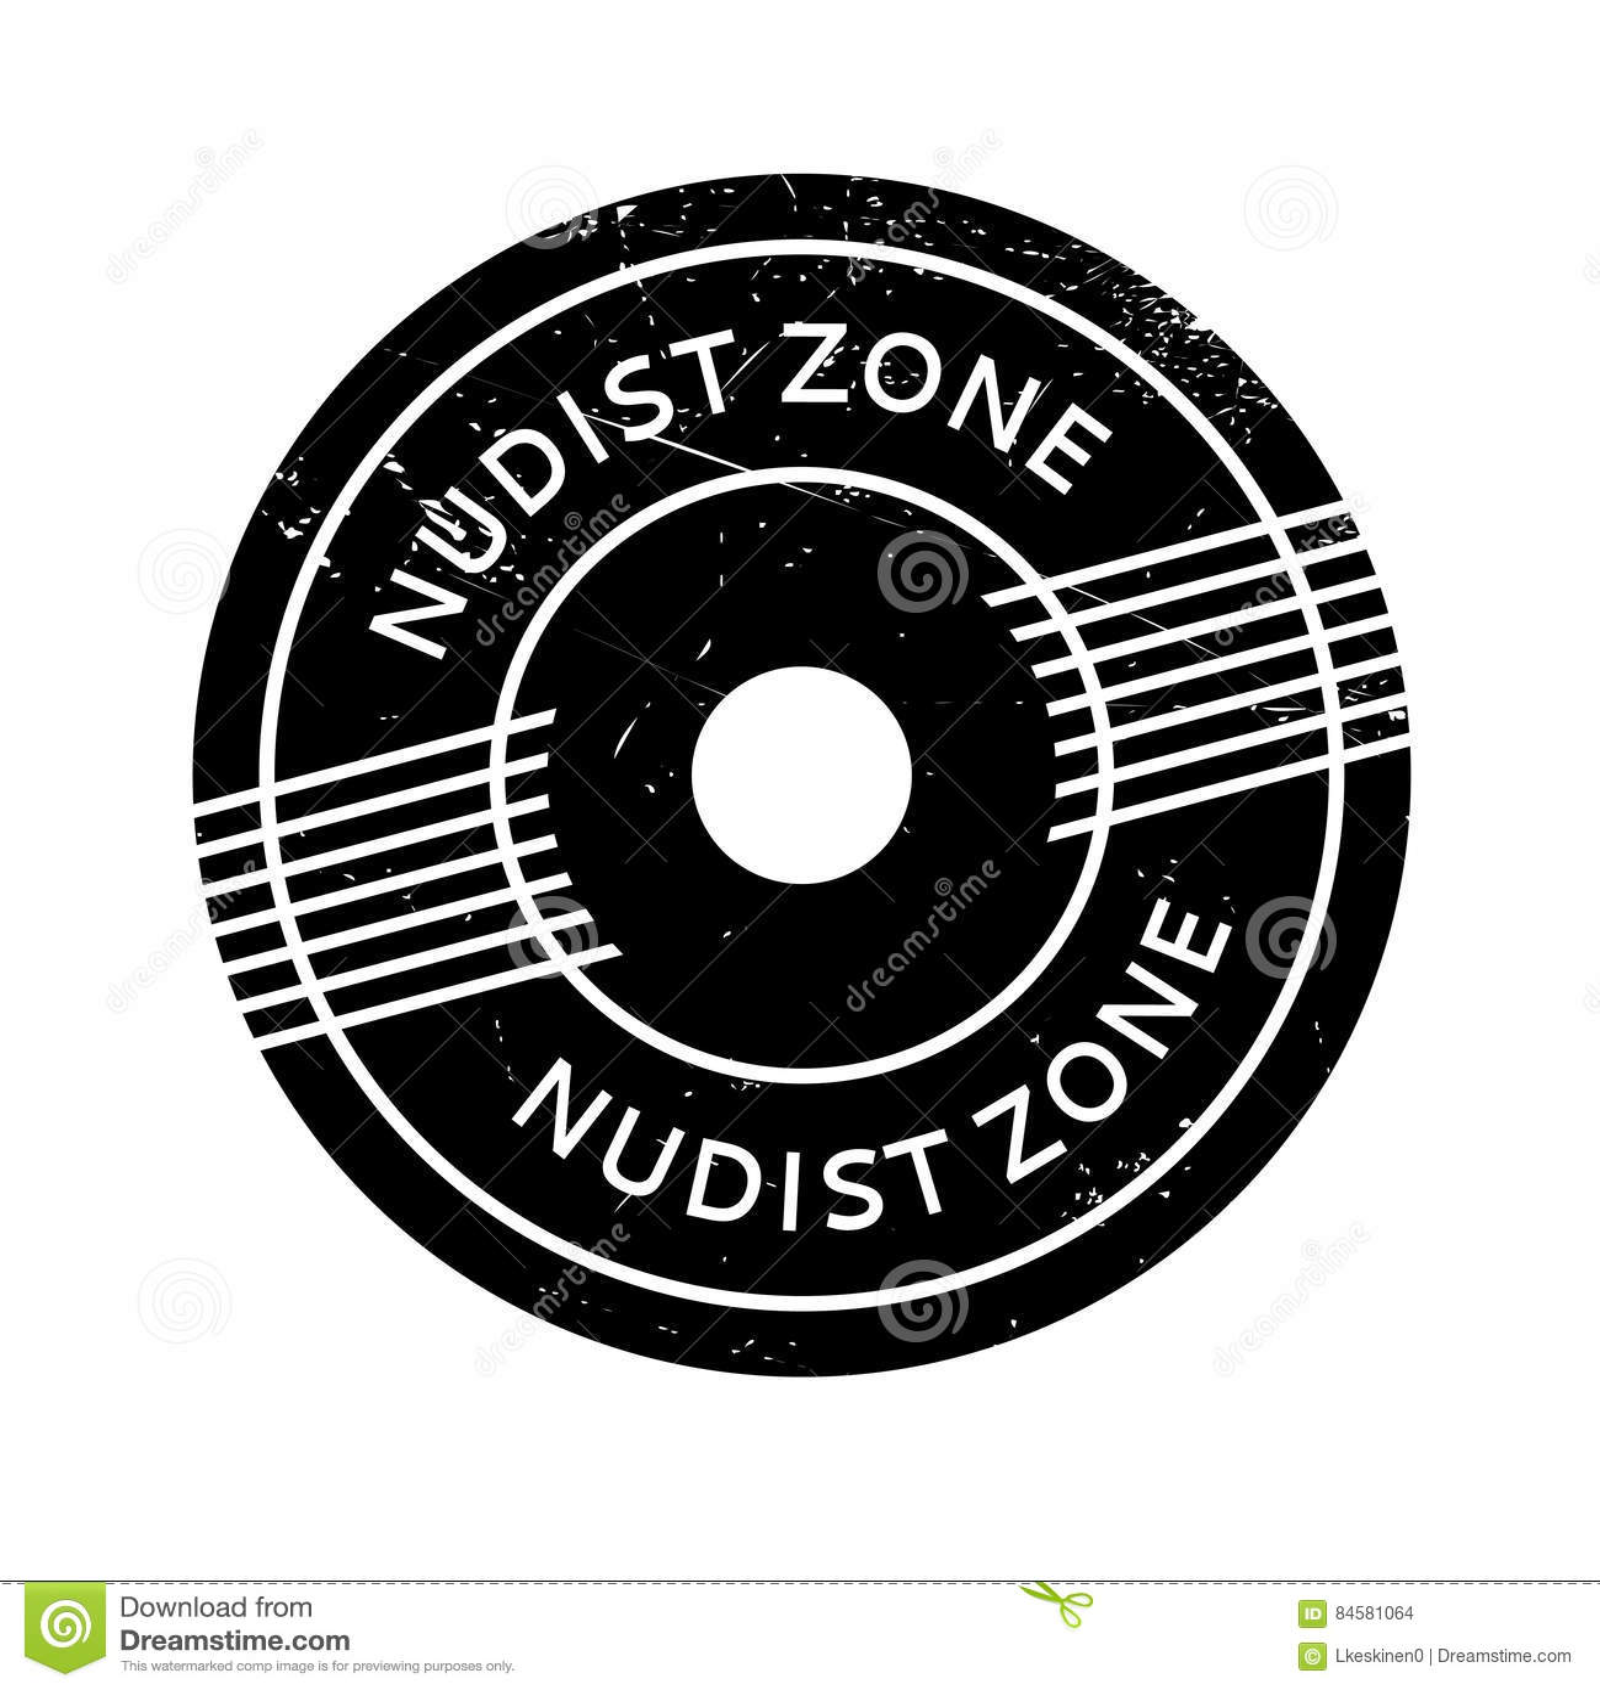 Nudist Zone Nudist Zone rubber stamp